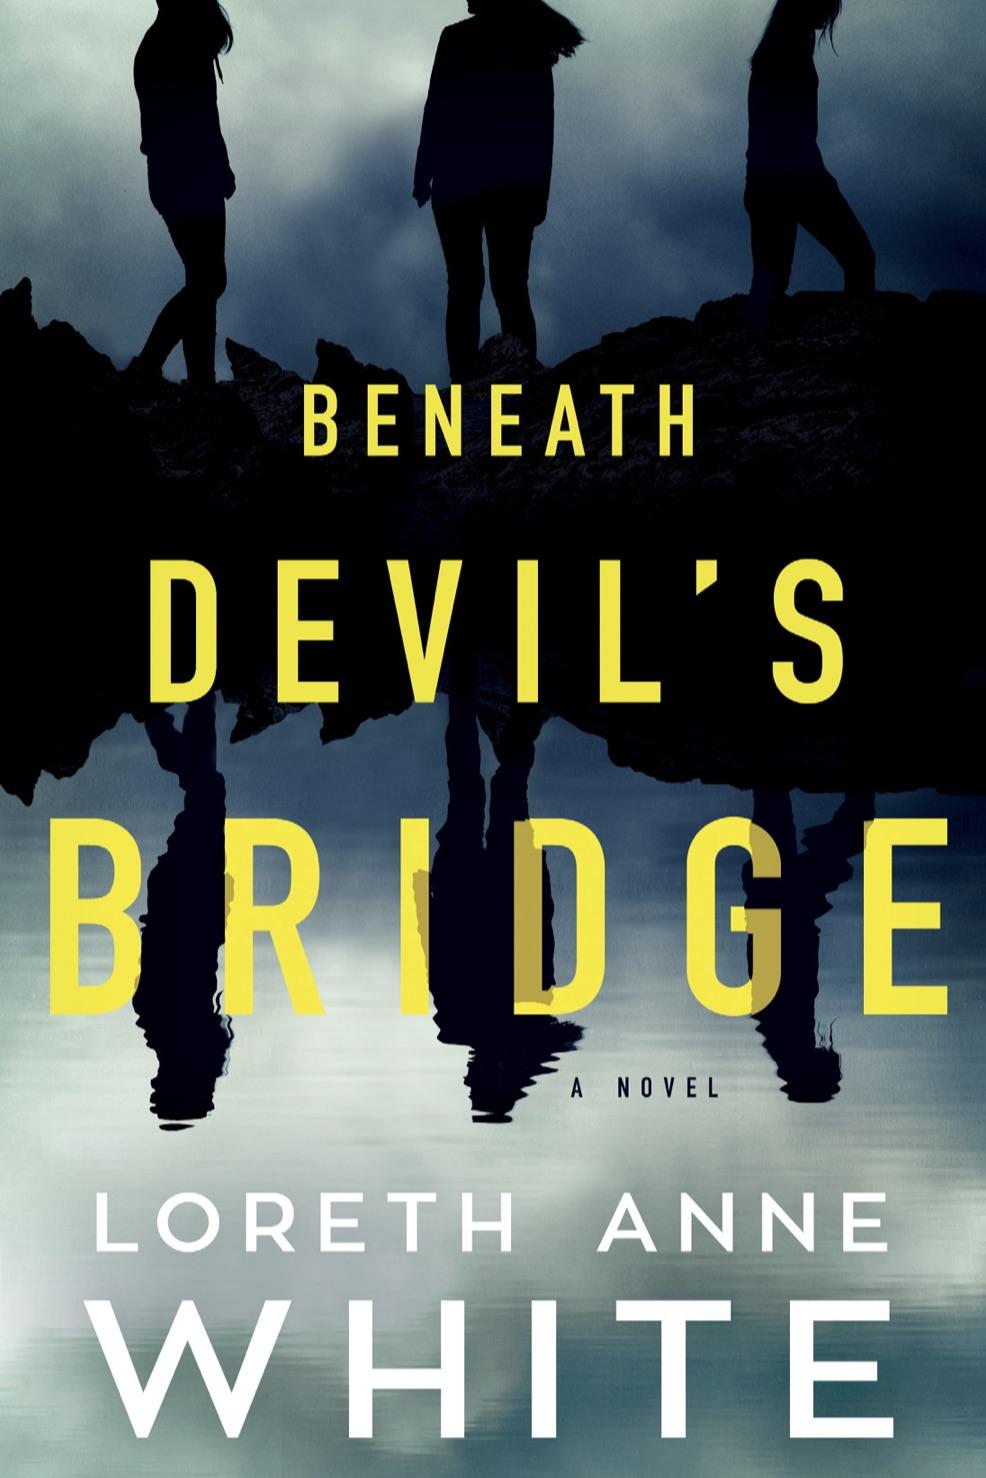 Beneath Devil's Bridge by Loreth Anne White